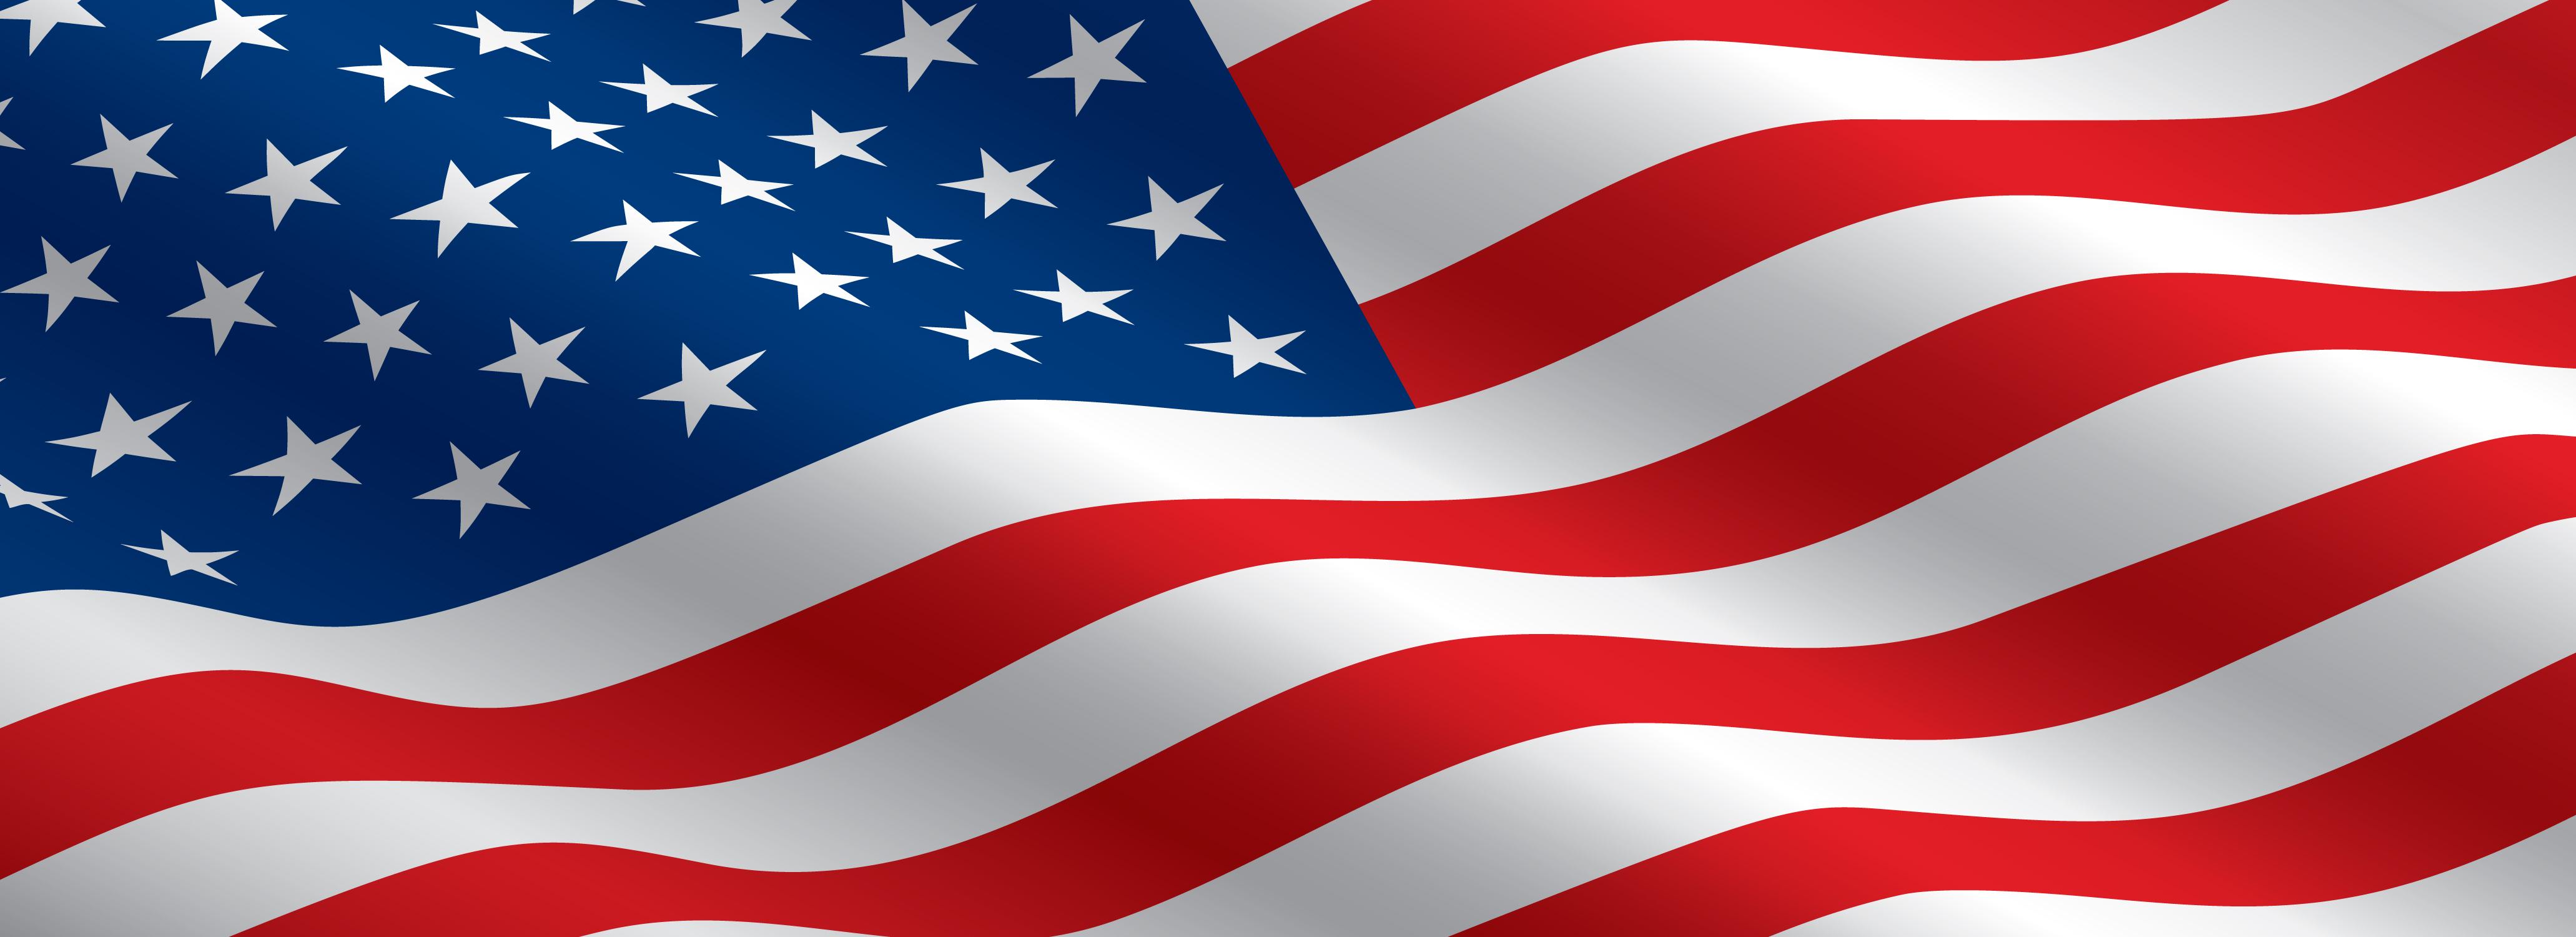 Us flag banner clipart.